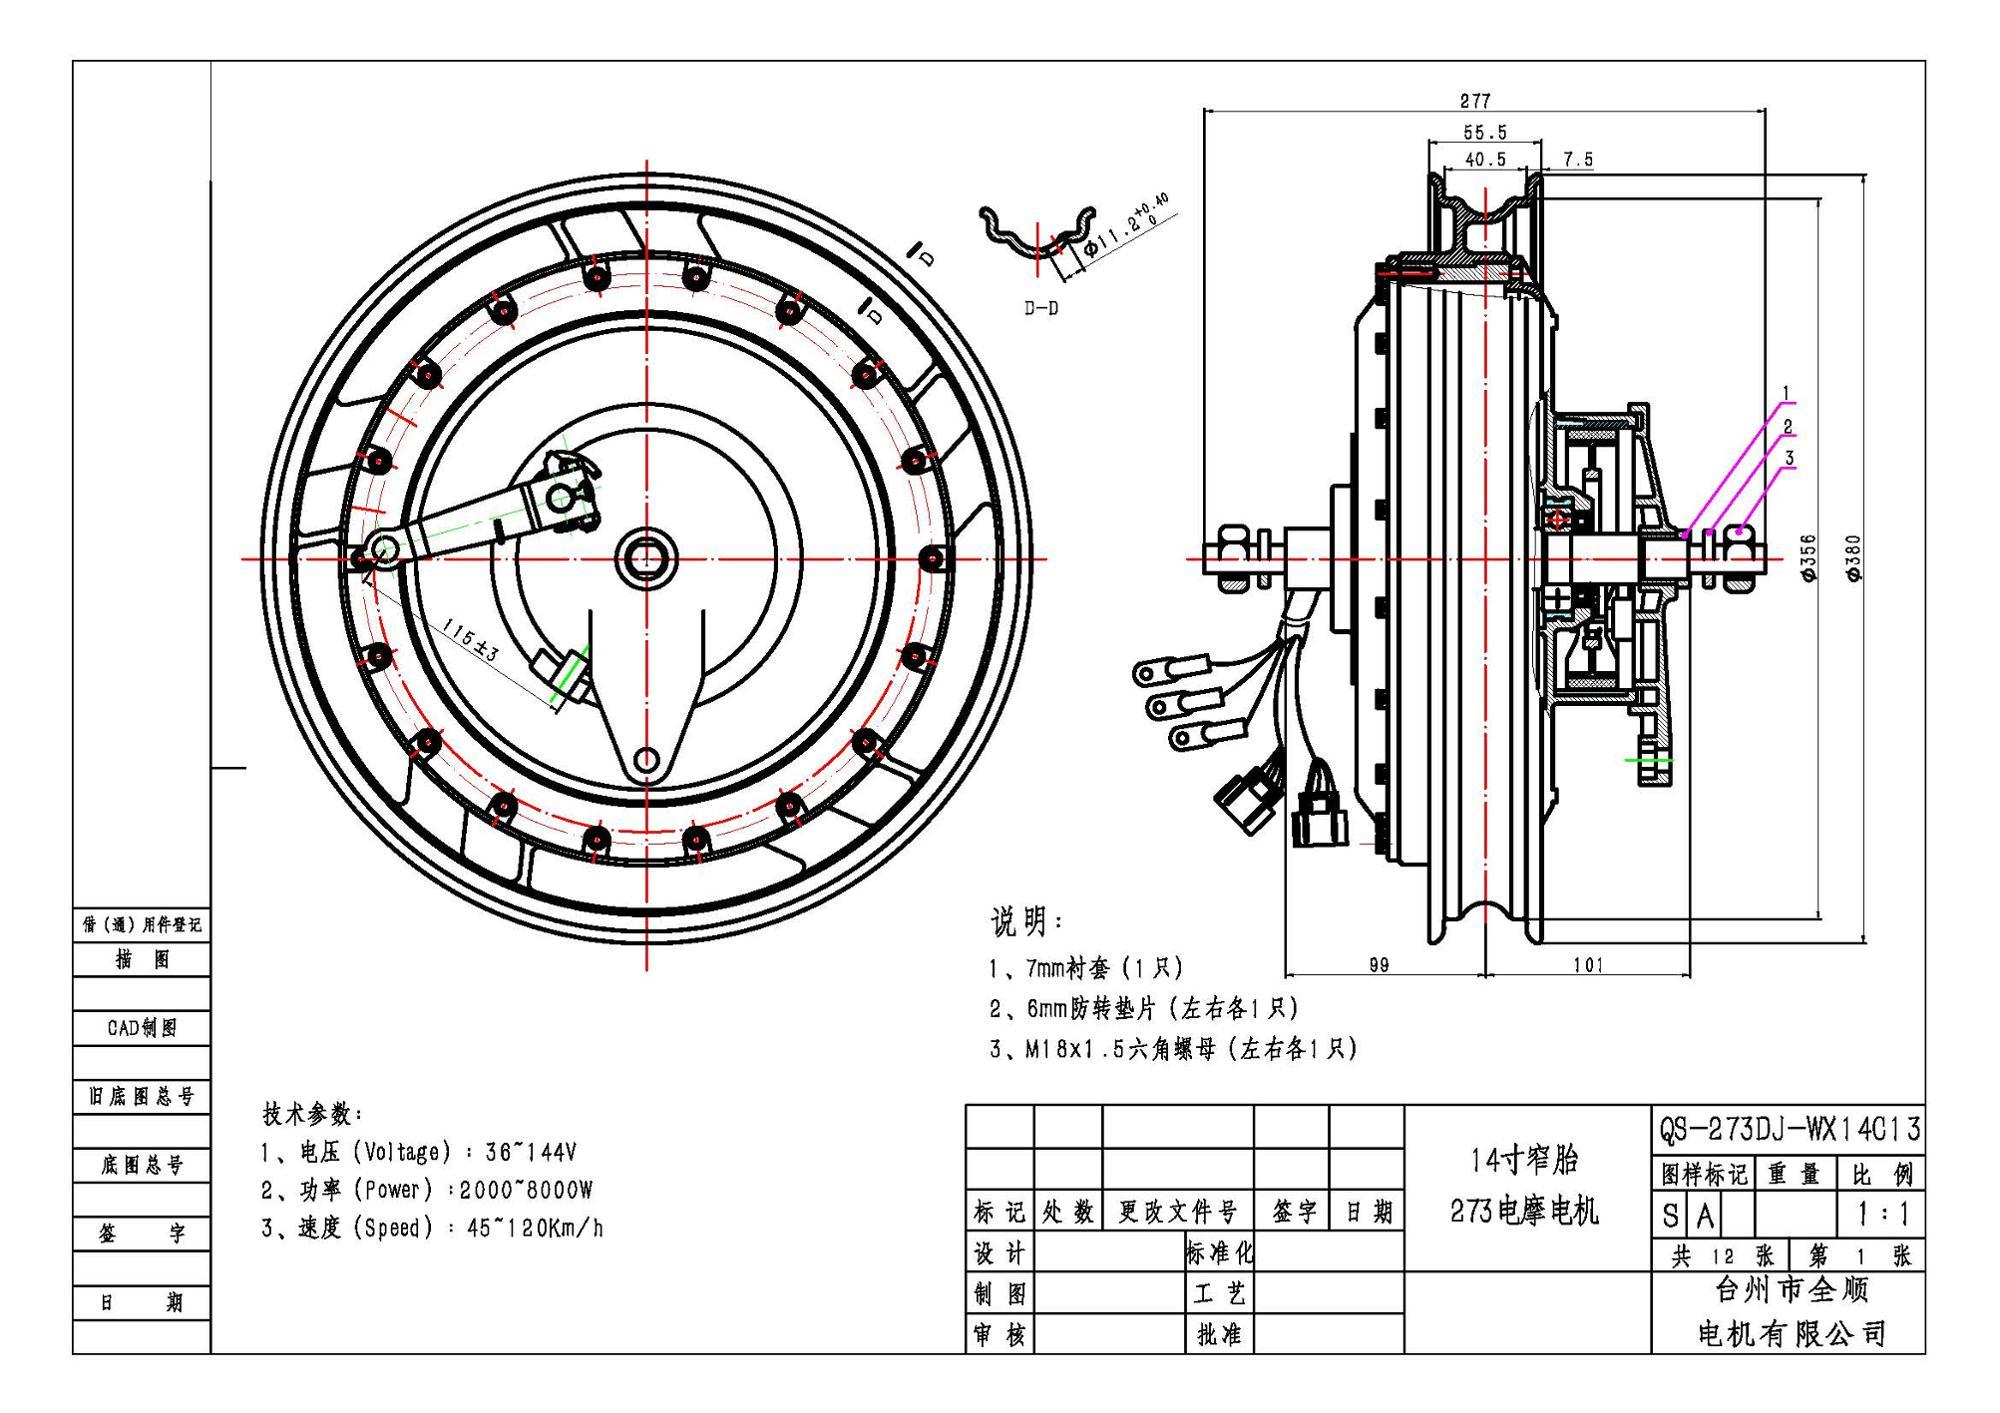 W V3 Brushless Dc Hub Motor For 14 Electric